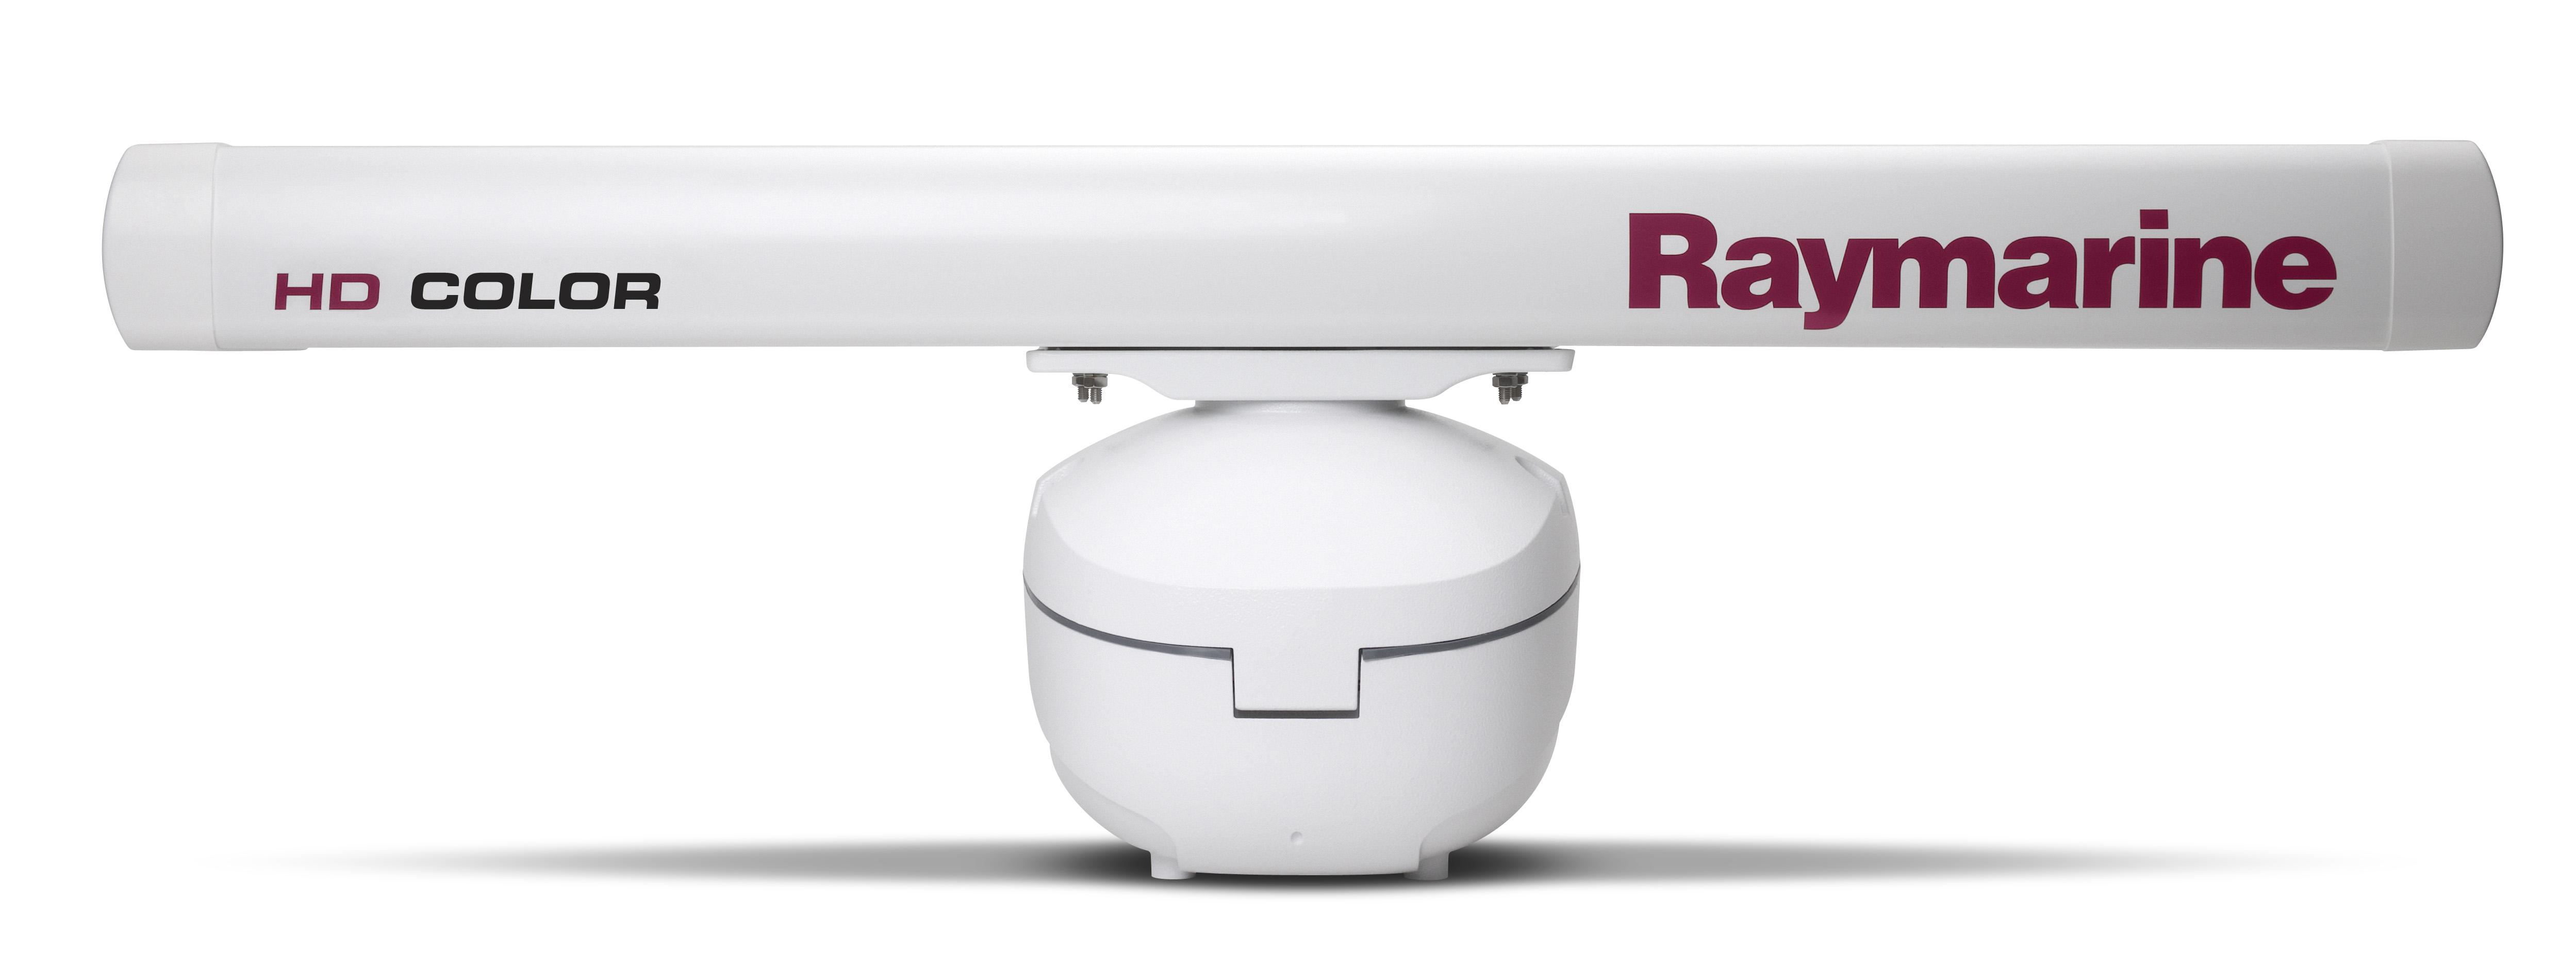 4ft hd color open array front radar